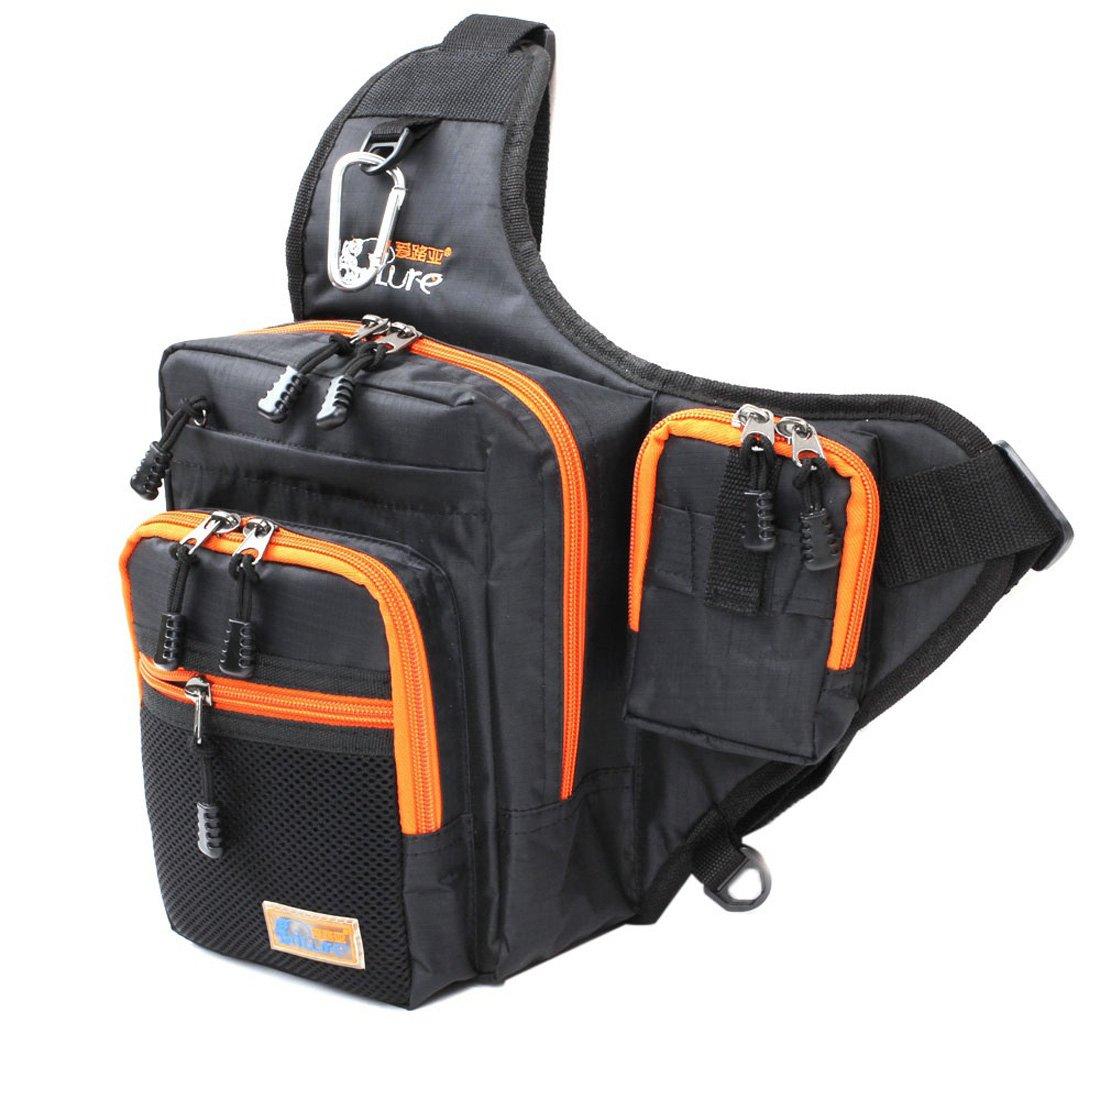 Ilure Fishing Bags Fishing Tackle Bag Multi-Purpose Waterproof Polyester Fishing Bag Carp Fishing Gear Lure Tackle Box